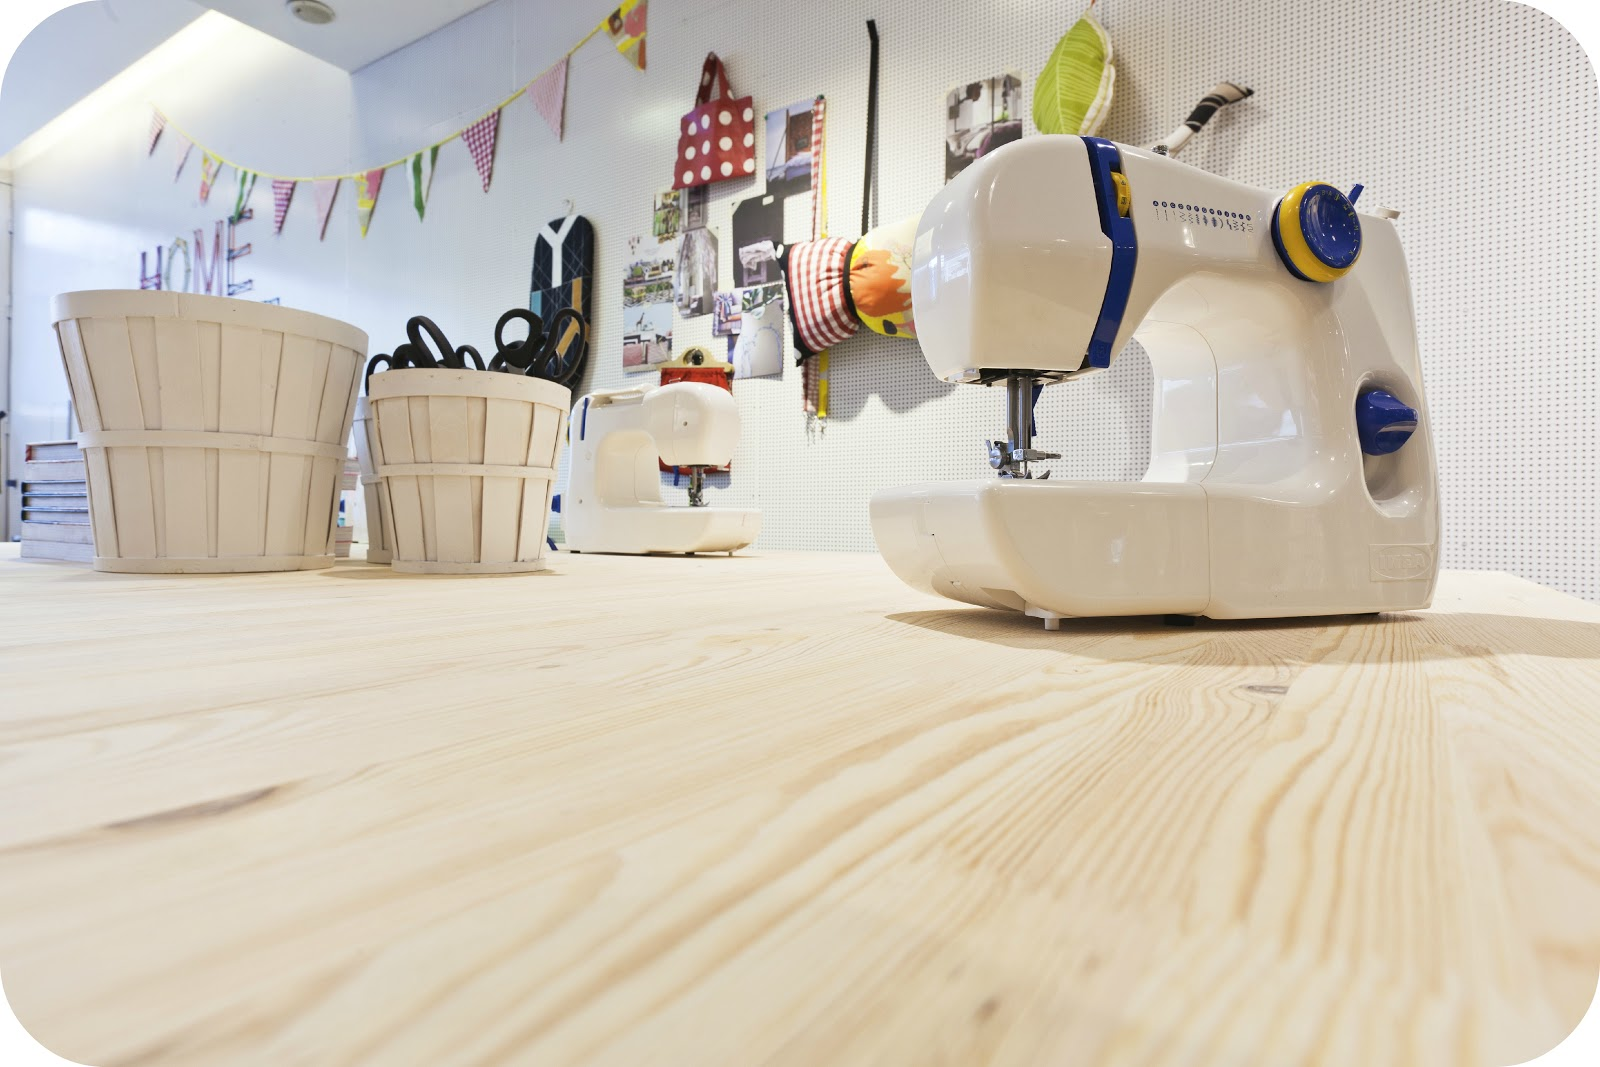 le jardin de juliette ikea pop up expo atelier. Black Bedroom Furniture Sets. Home Design Ideas